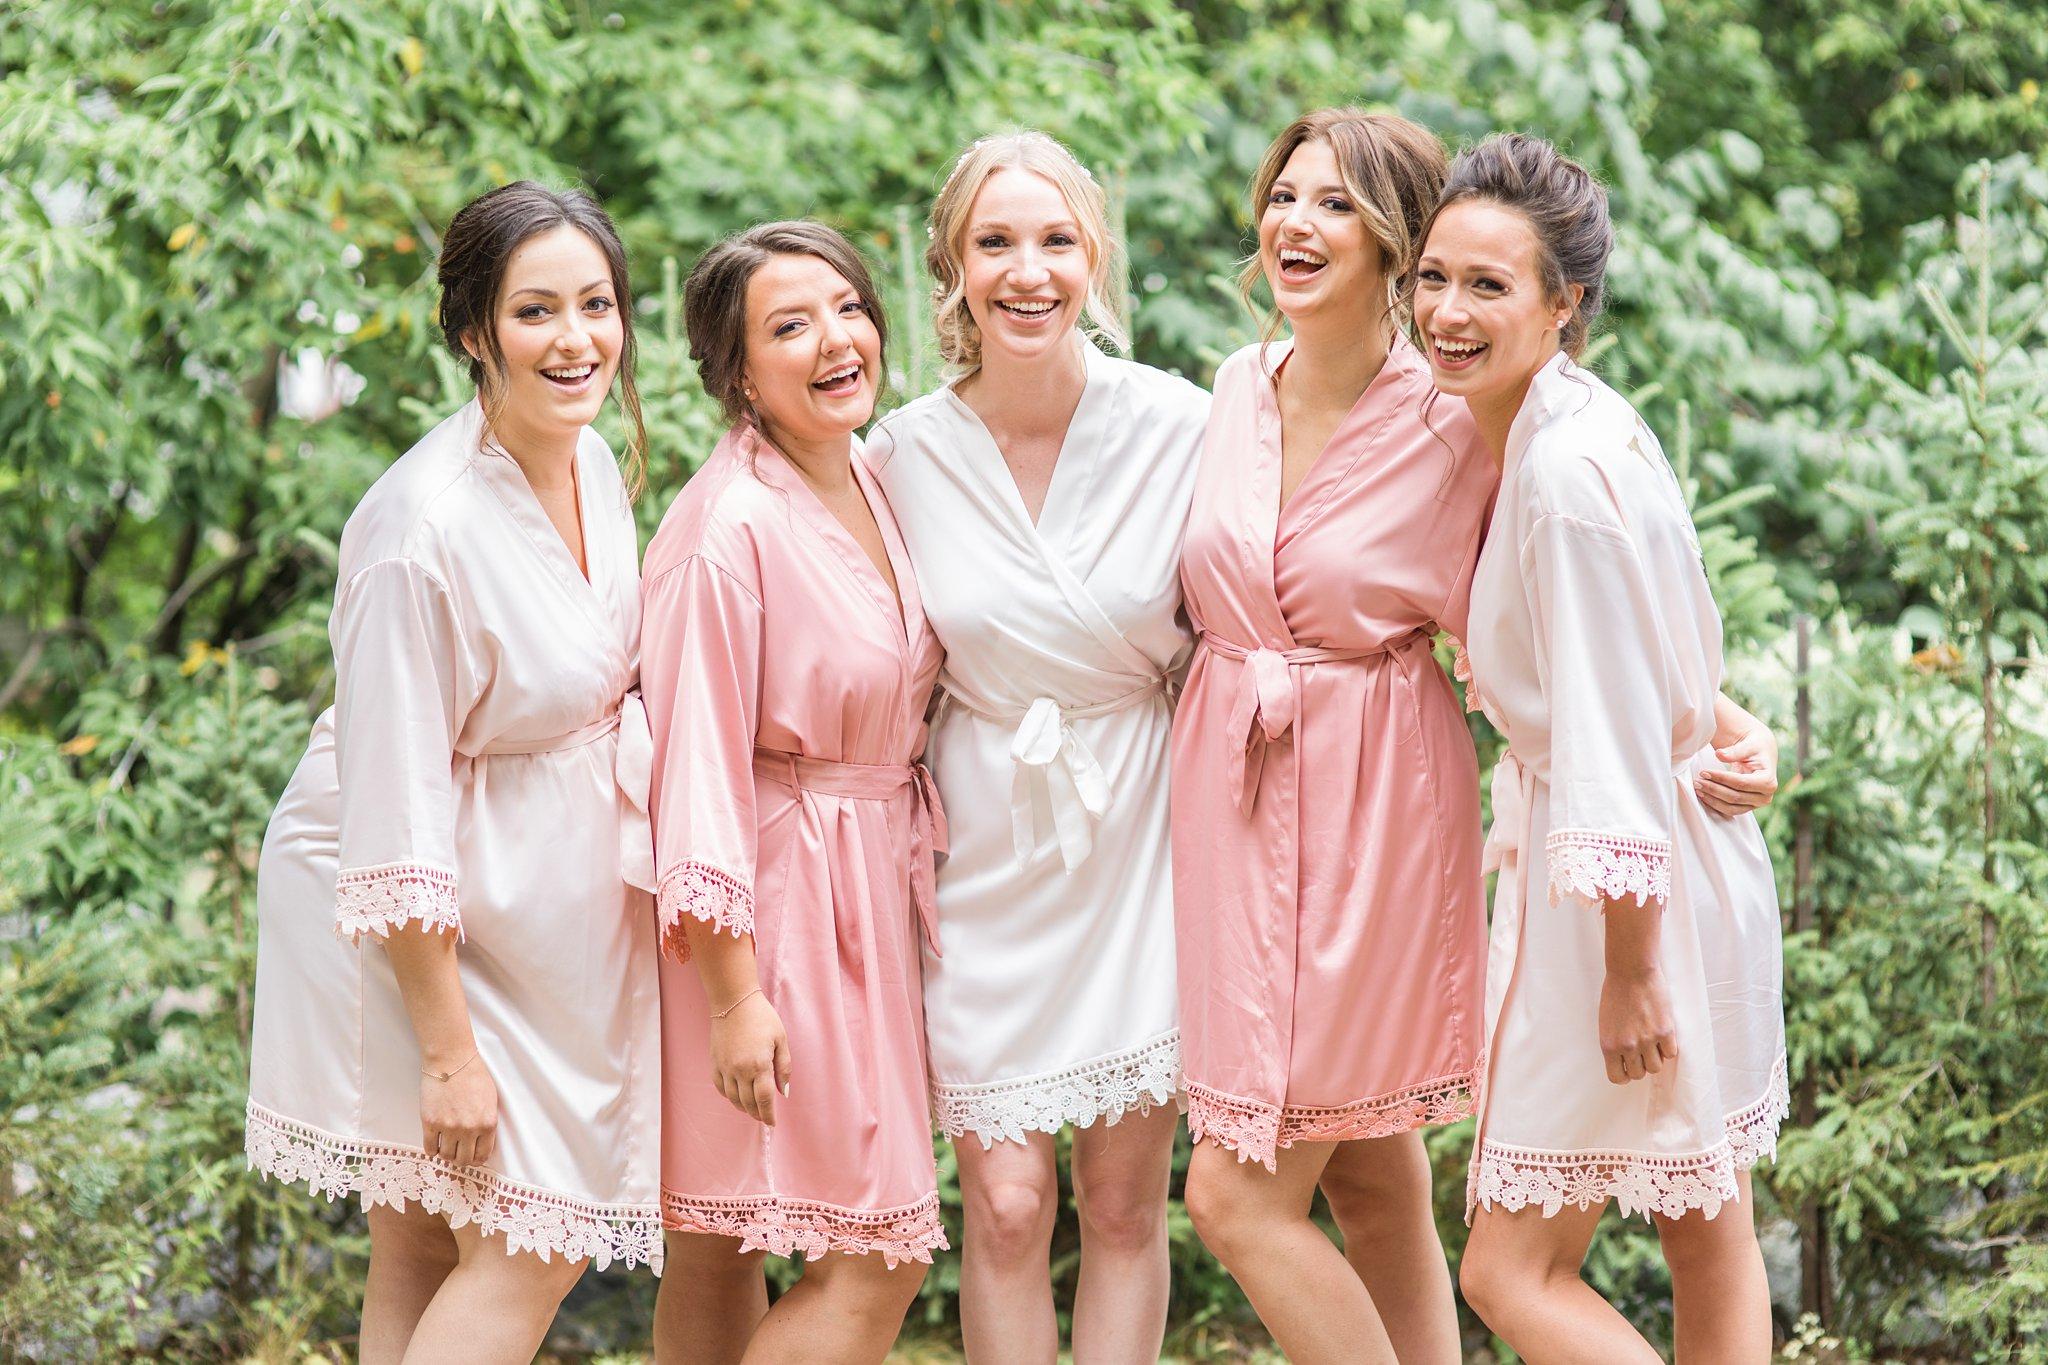 Robe shot, bridesmaids, Belle de Nuit, Wakefield wedding photos, Le Belvedere